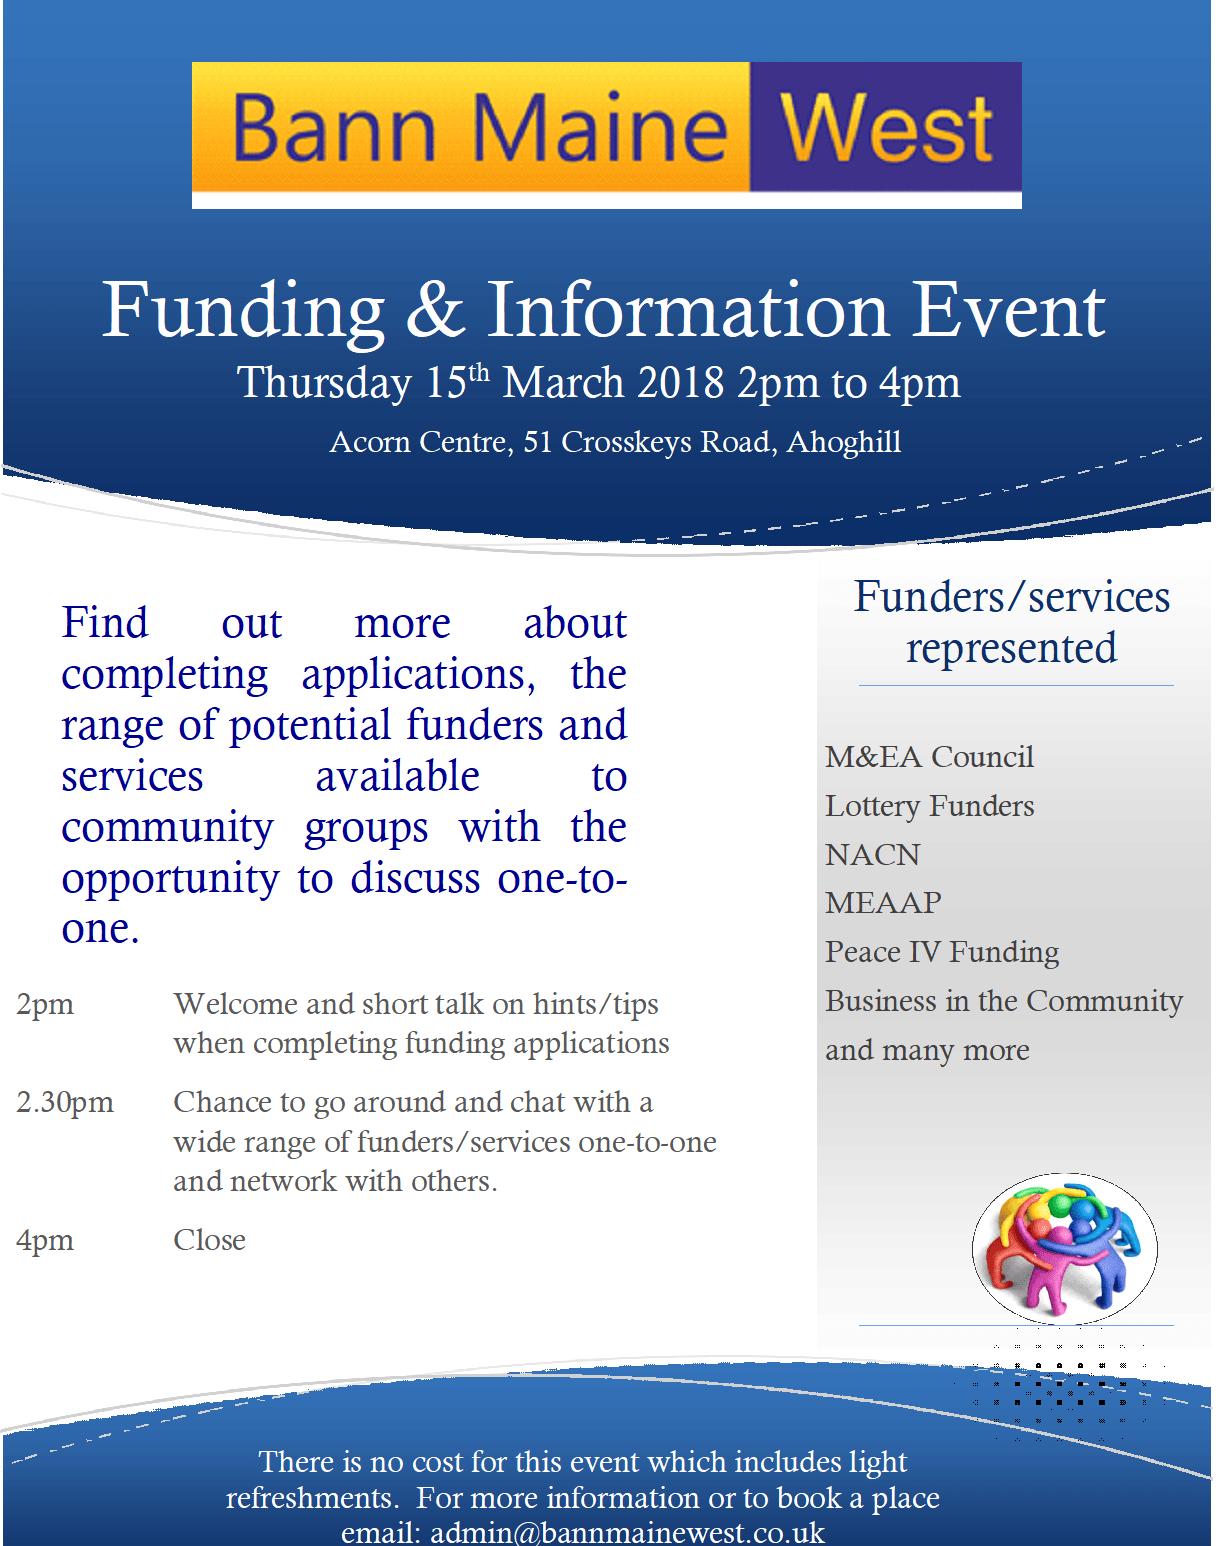 Funding Information Event – Bann Maine West